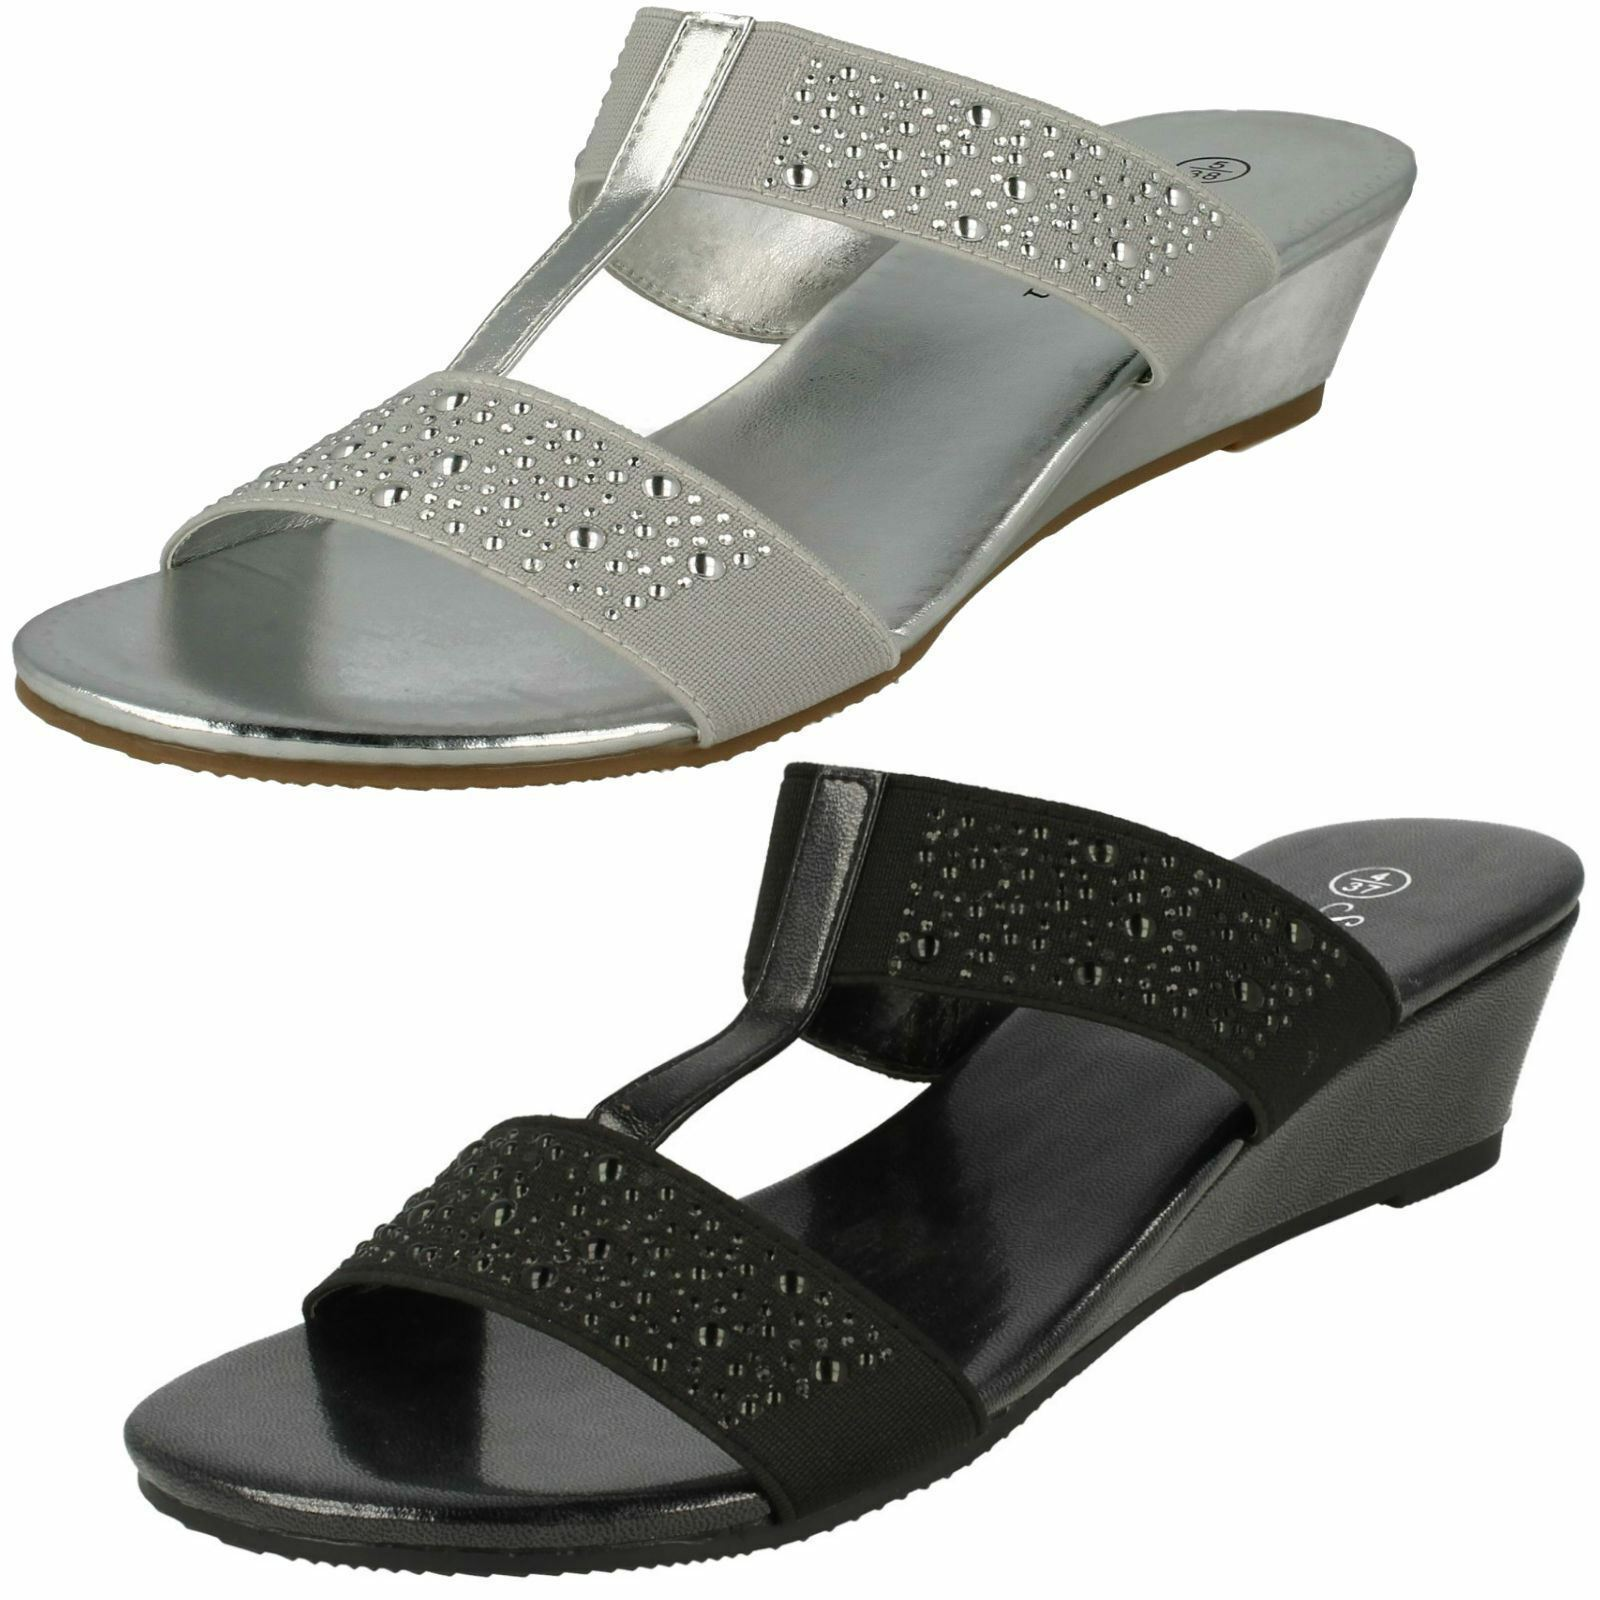 F10736- las Señoras Savannah Sandalias- de Cuña Zapatos sin Talón Sandalias- Savannah Negro&Plateado 04beaa